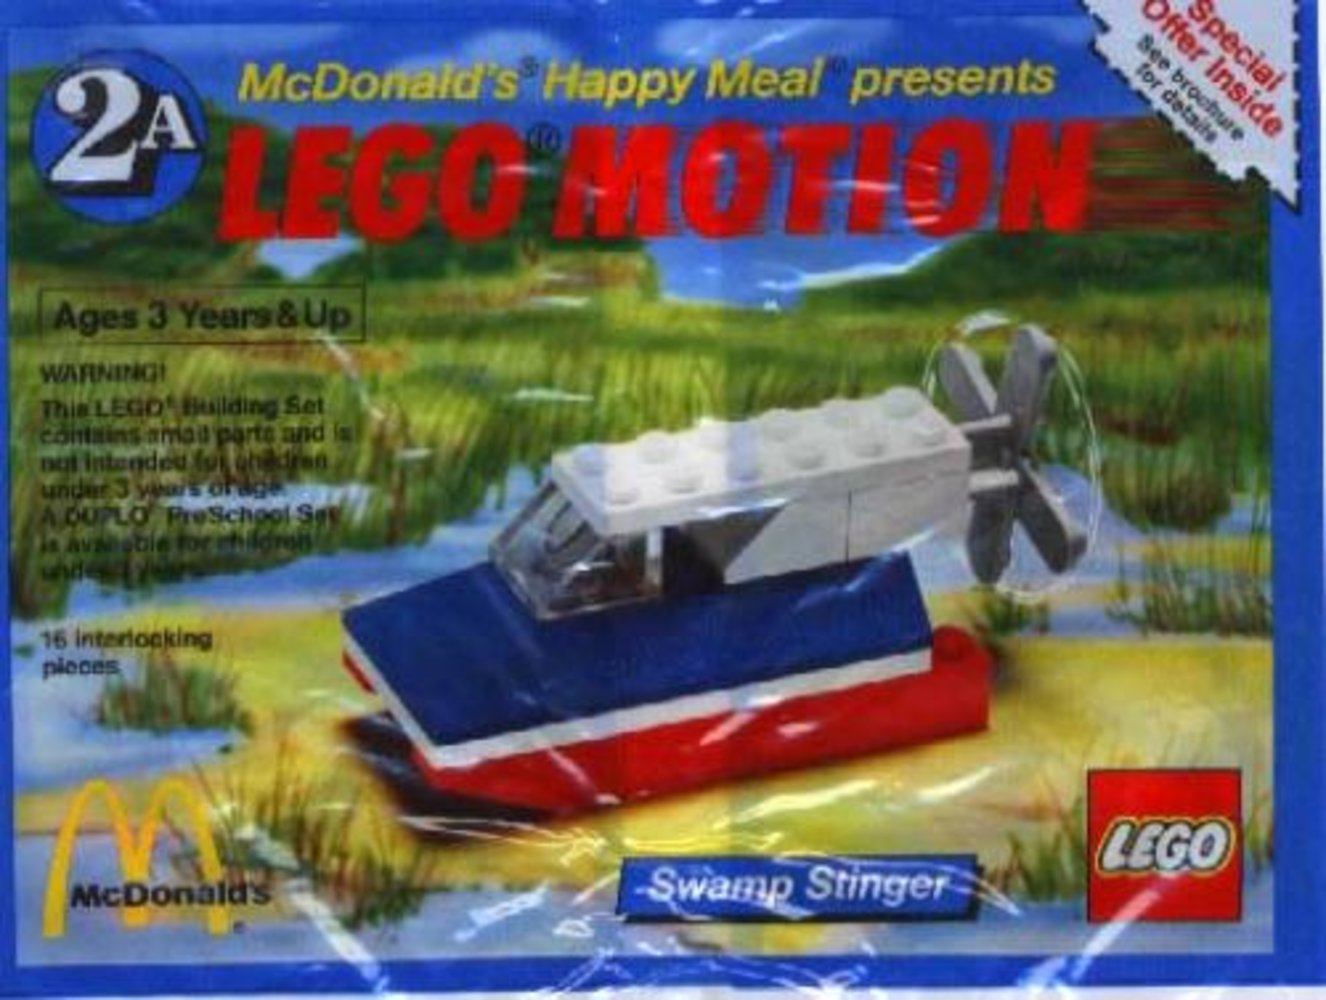 Lego Motion 2A, Swamp Stinger